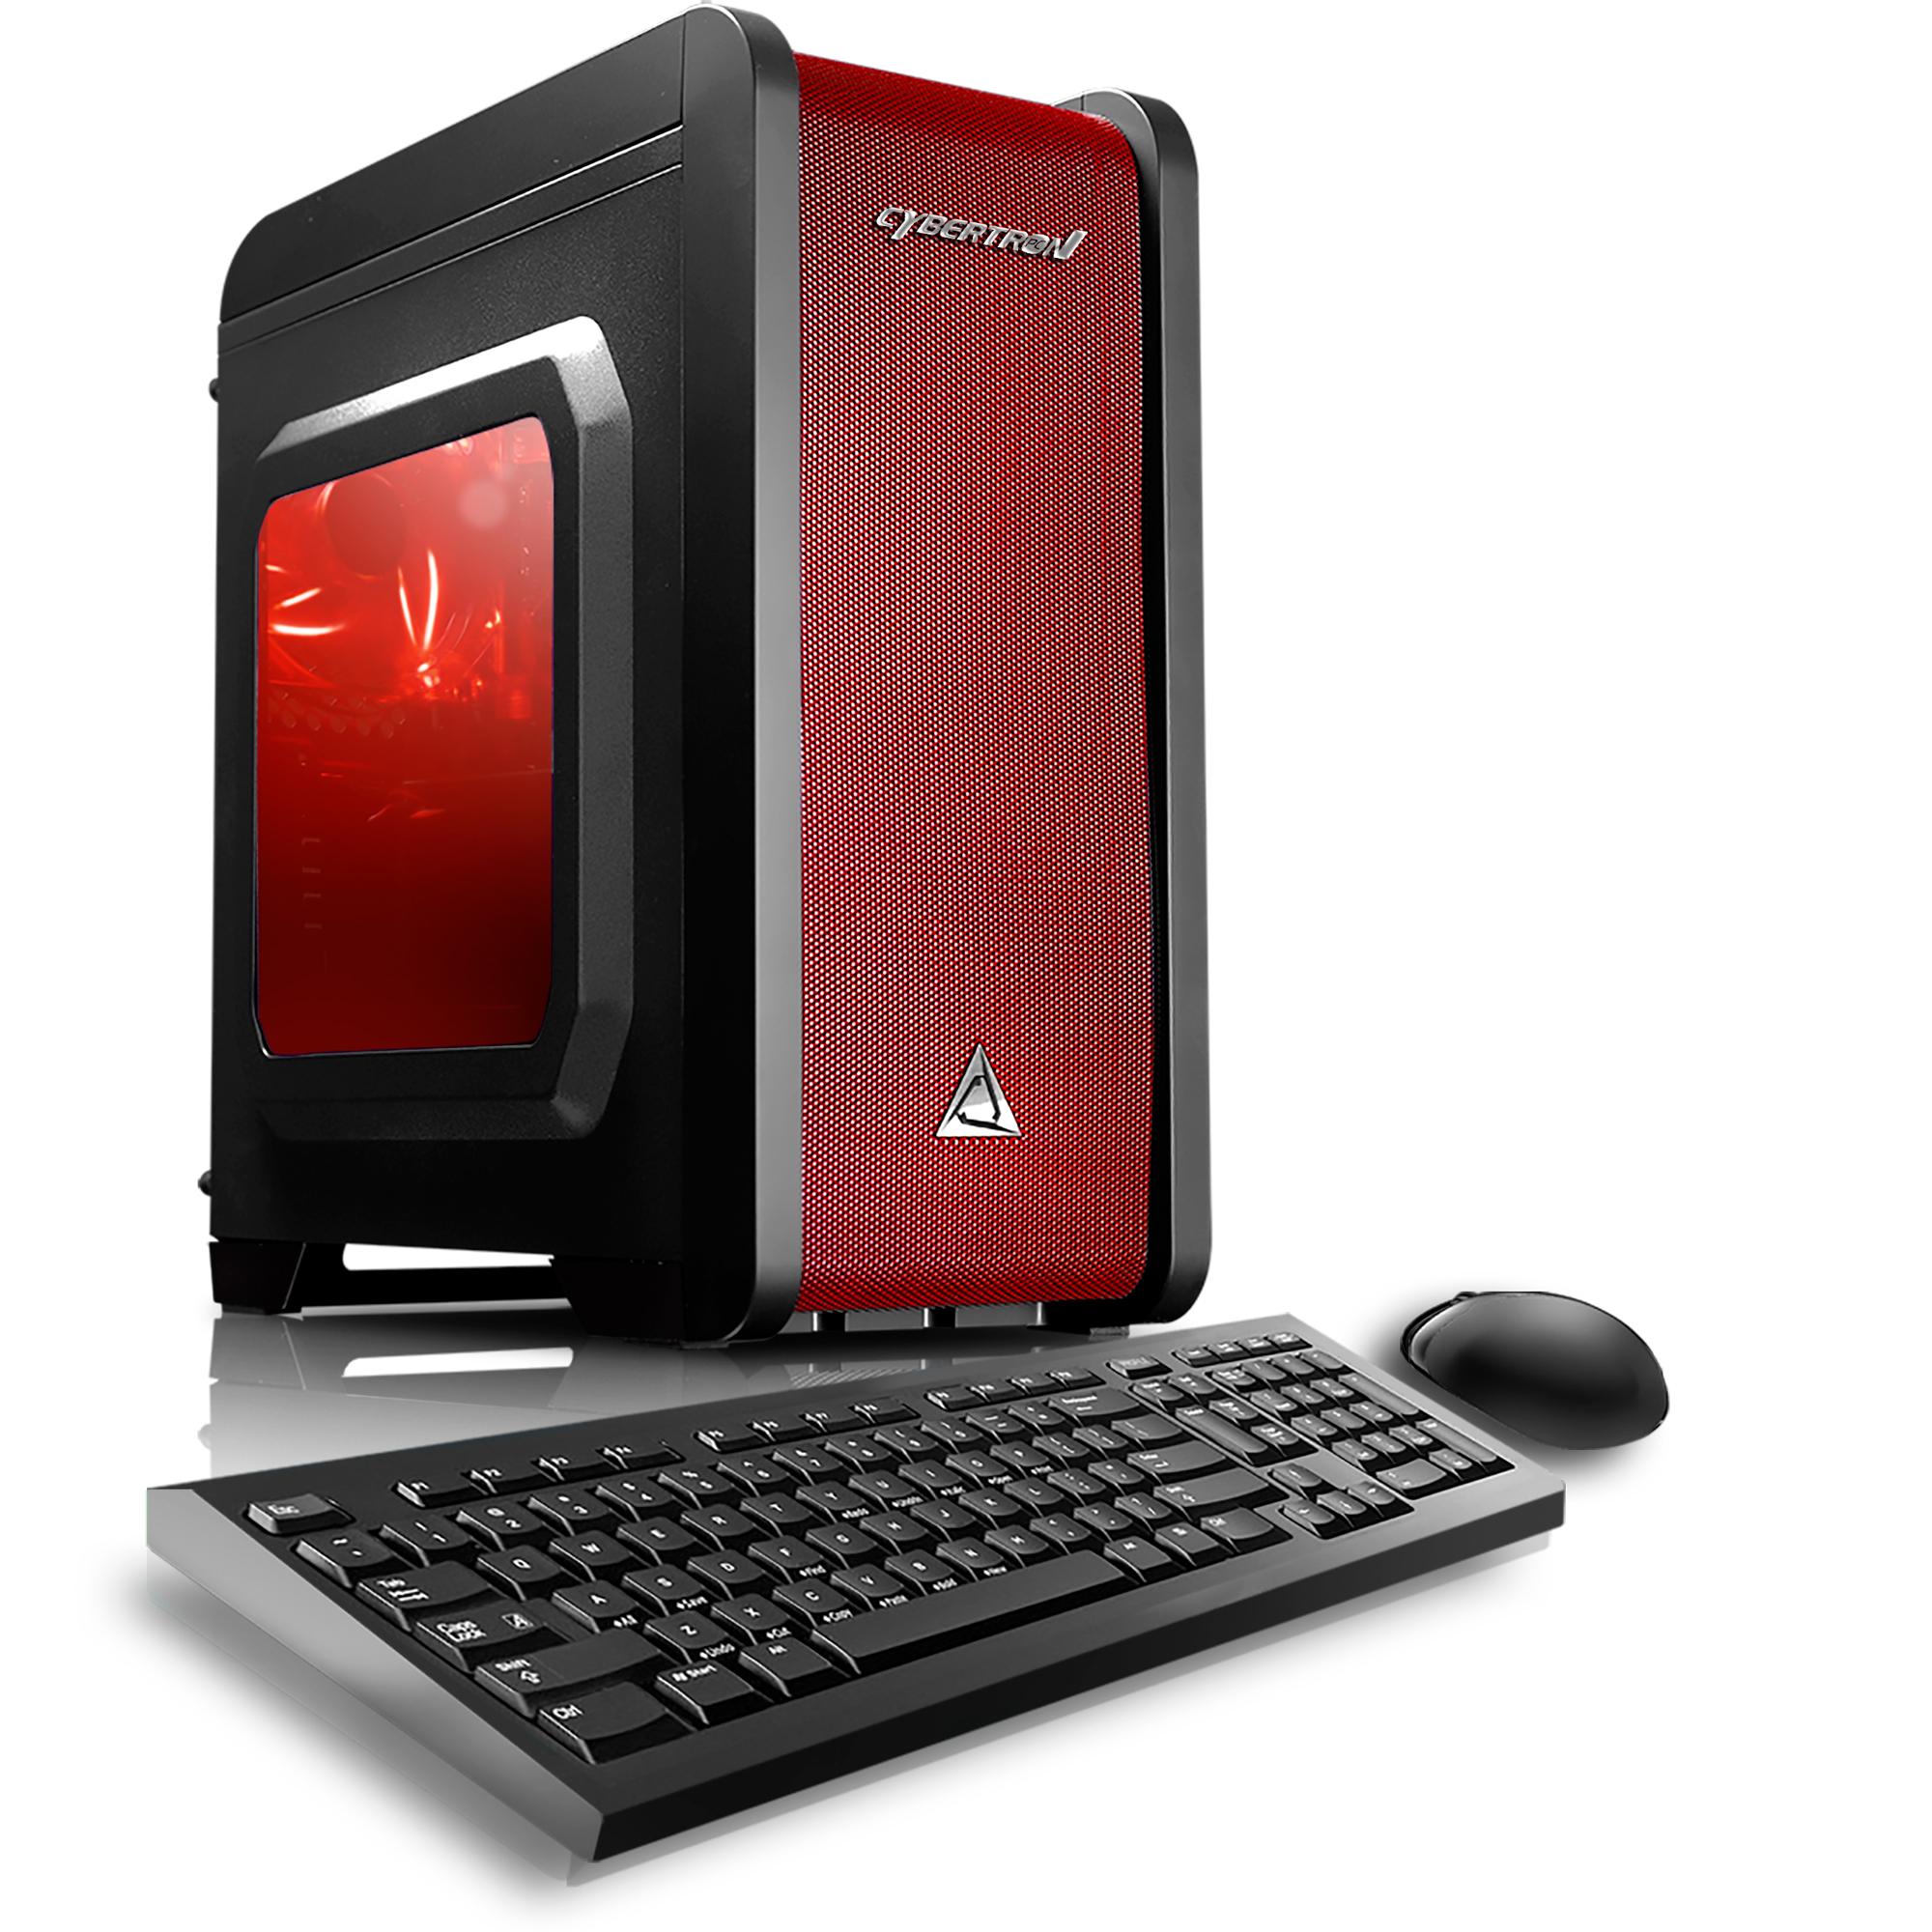 CybertronPC TGMELCQSGT726BR Electrum QS GT7 Red AMD FX